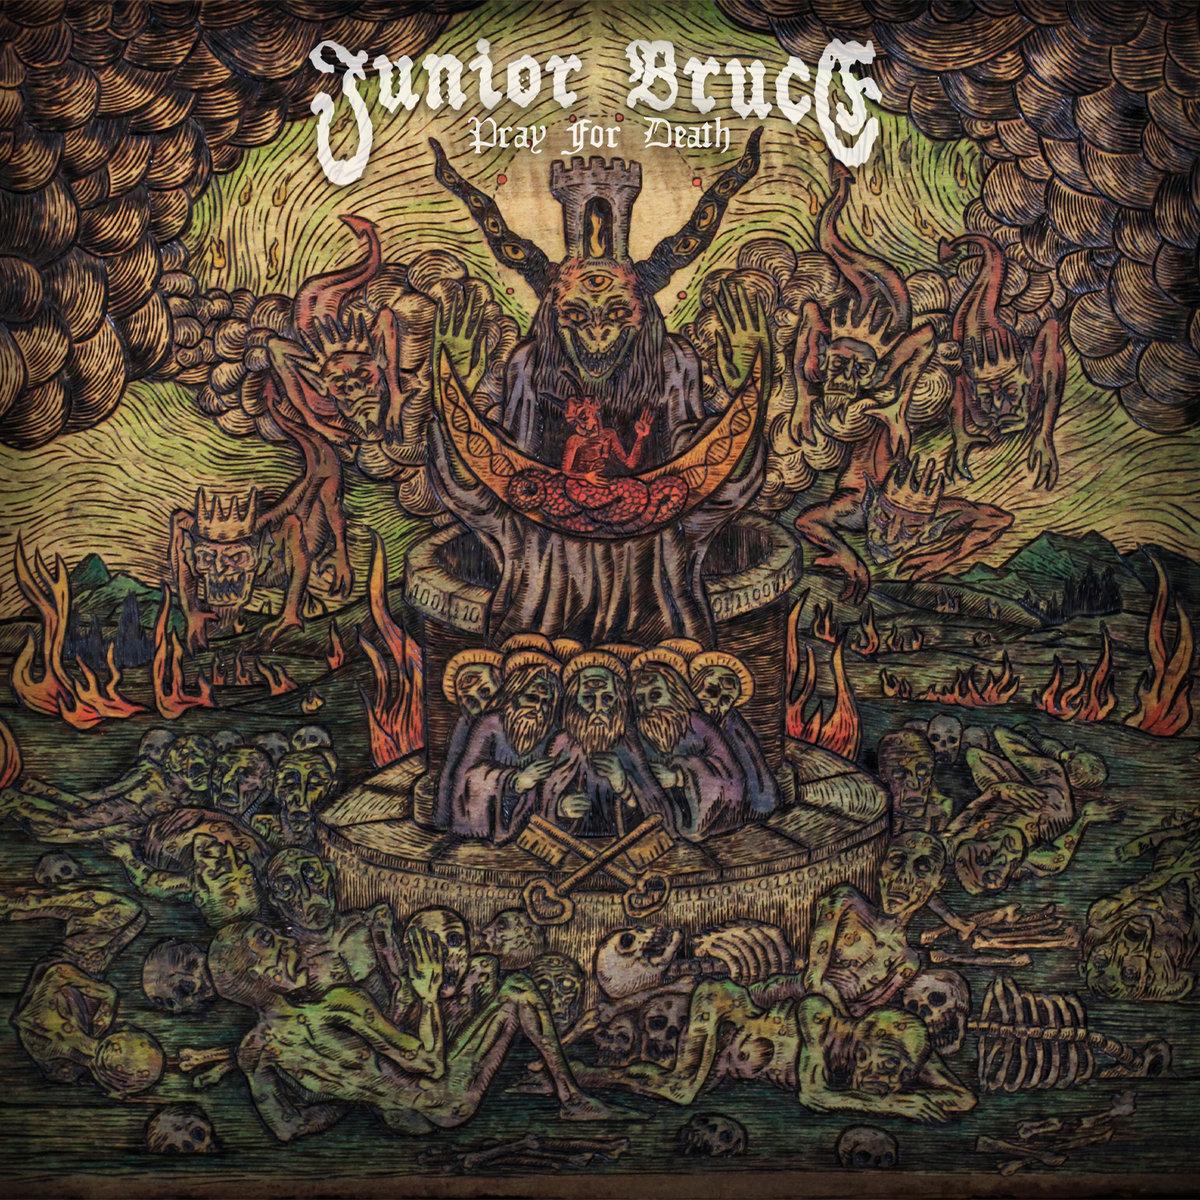 Junior Bruce – Pray For Death